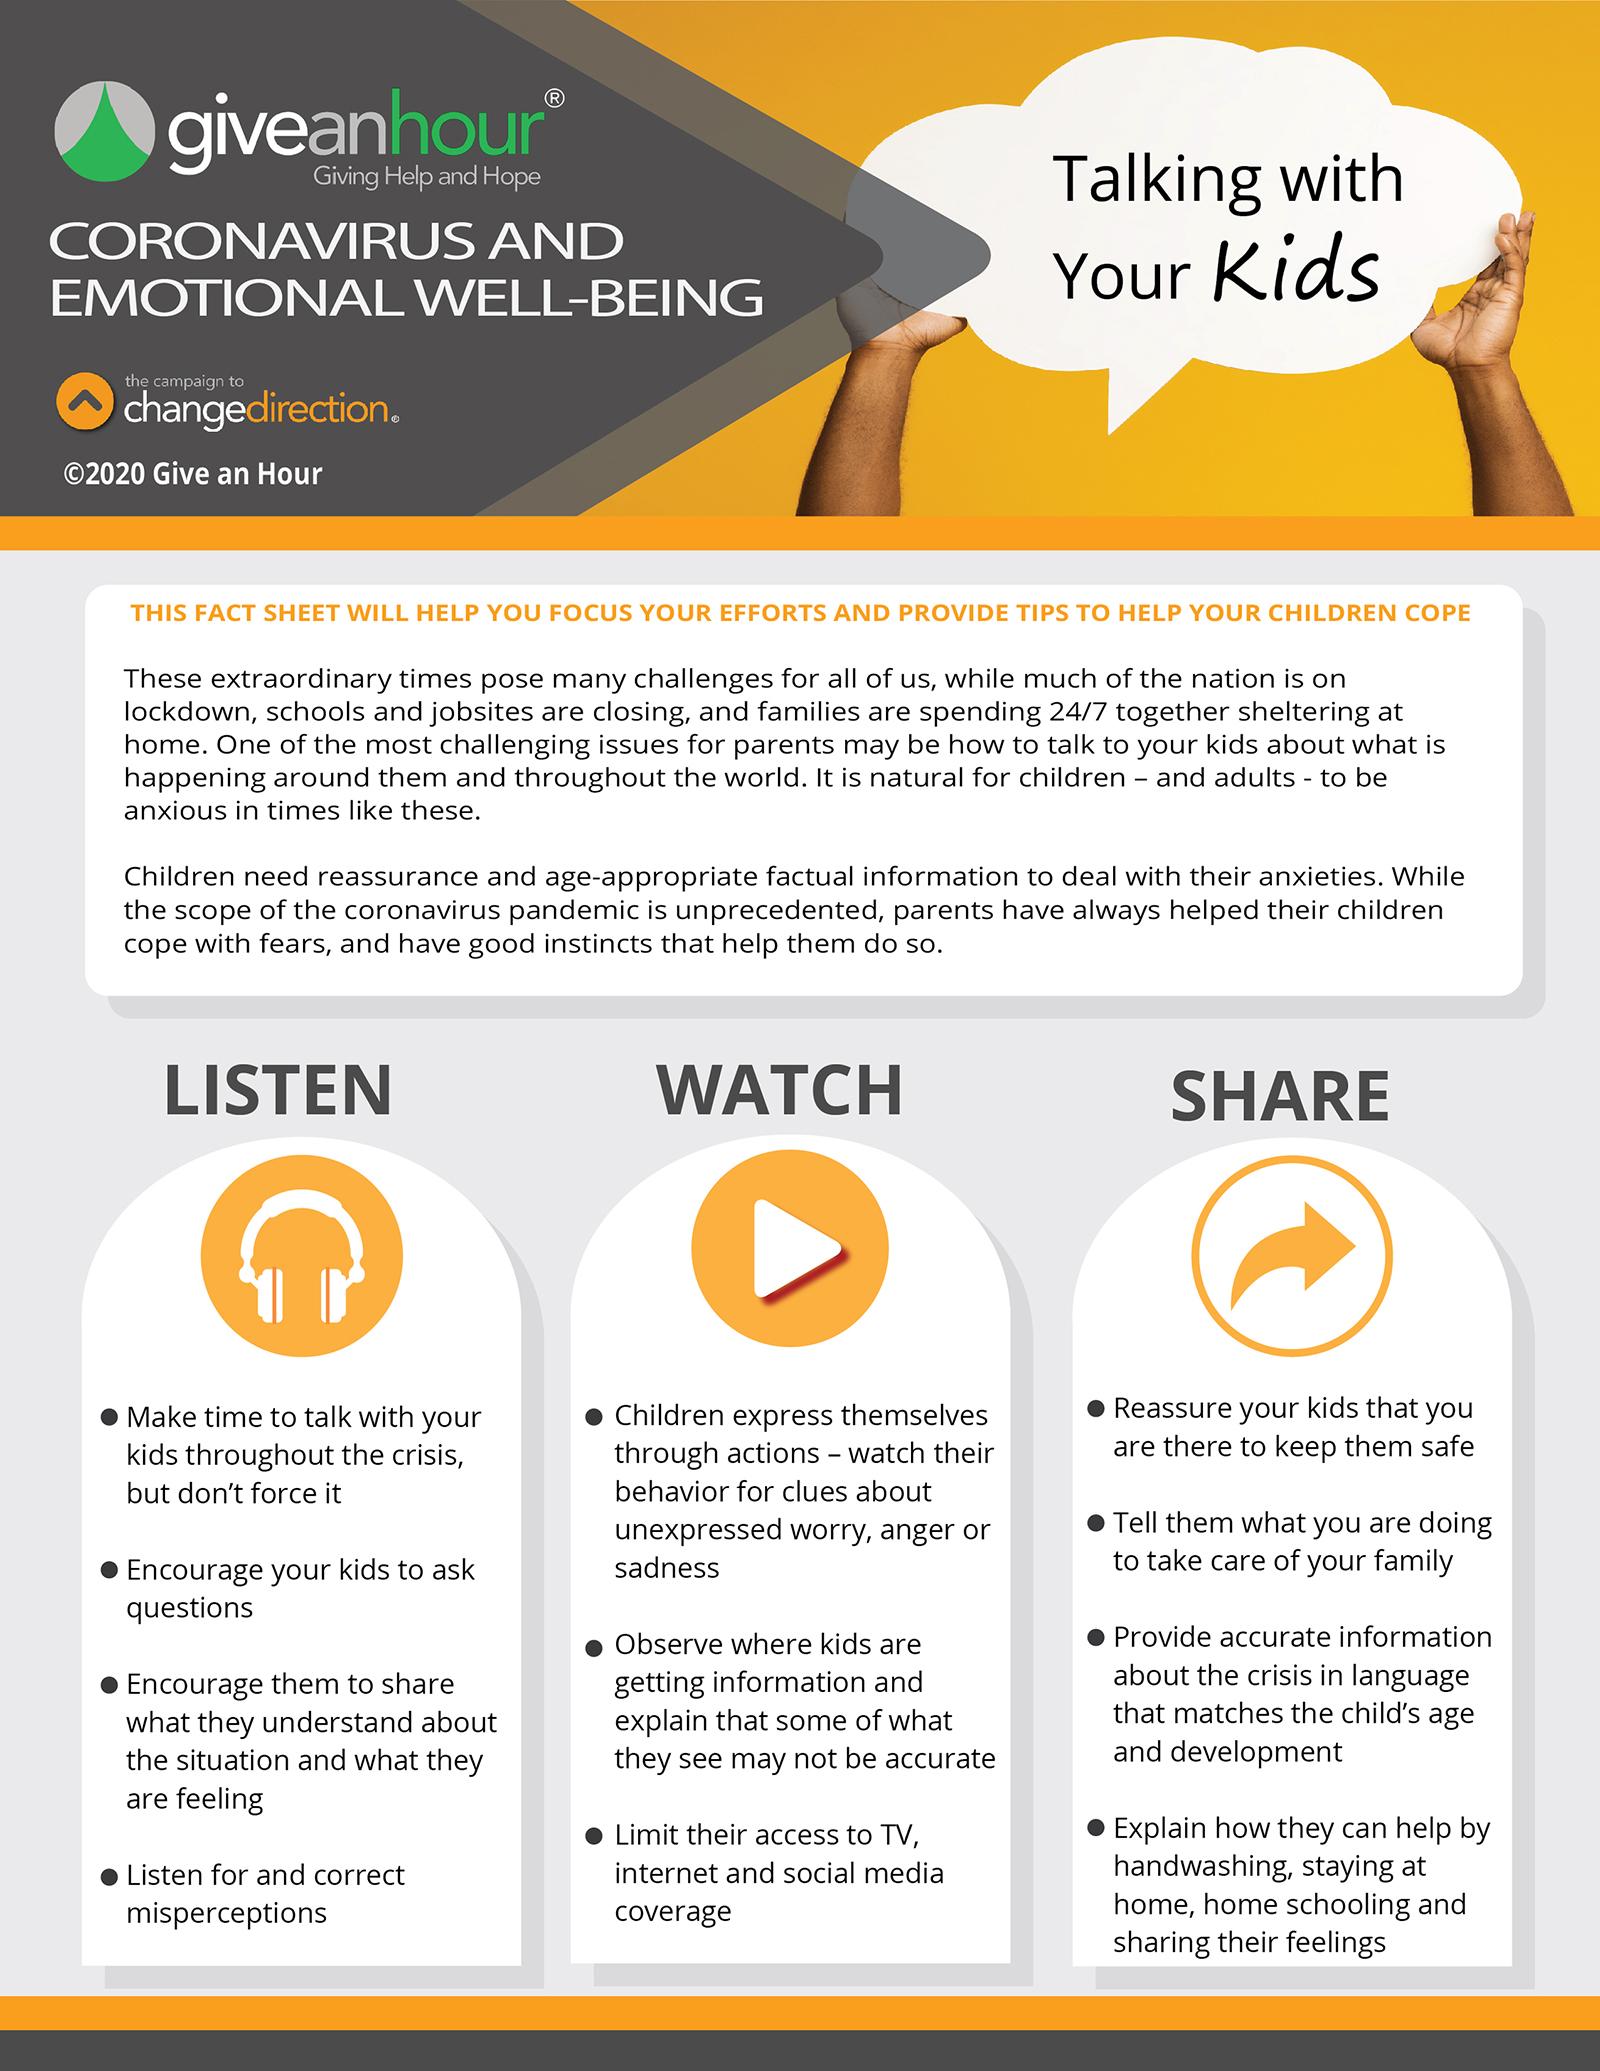 https://homelandmagazine.com/wp-content/uploads/2020/03/PDF-Talking-with-your-kids.jpg